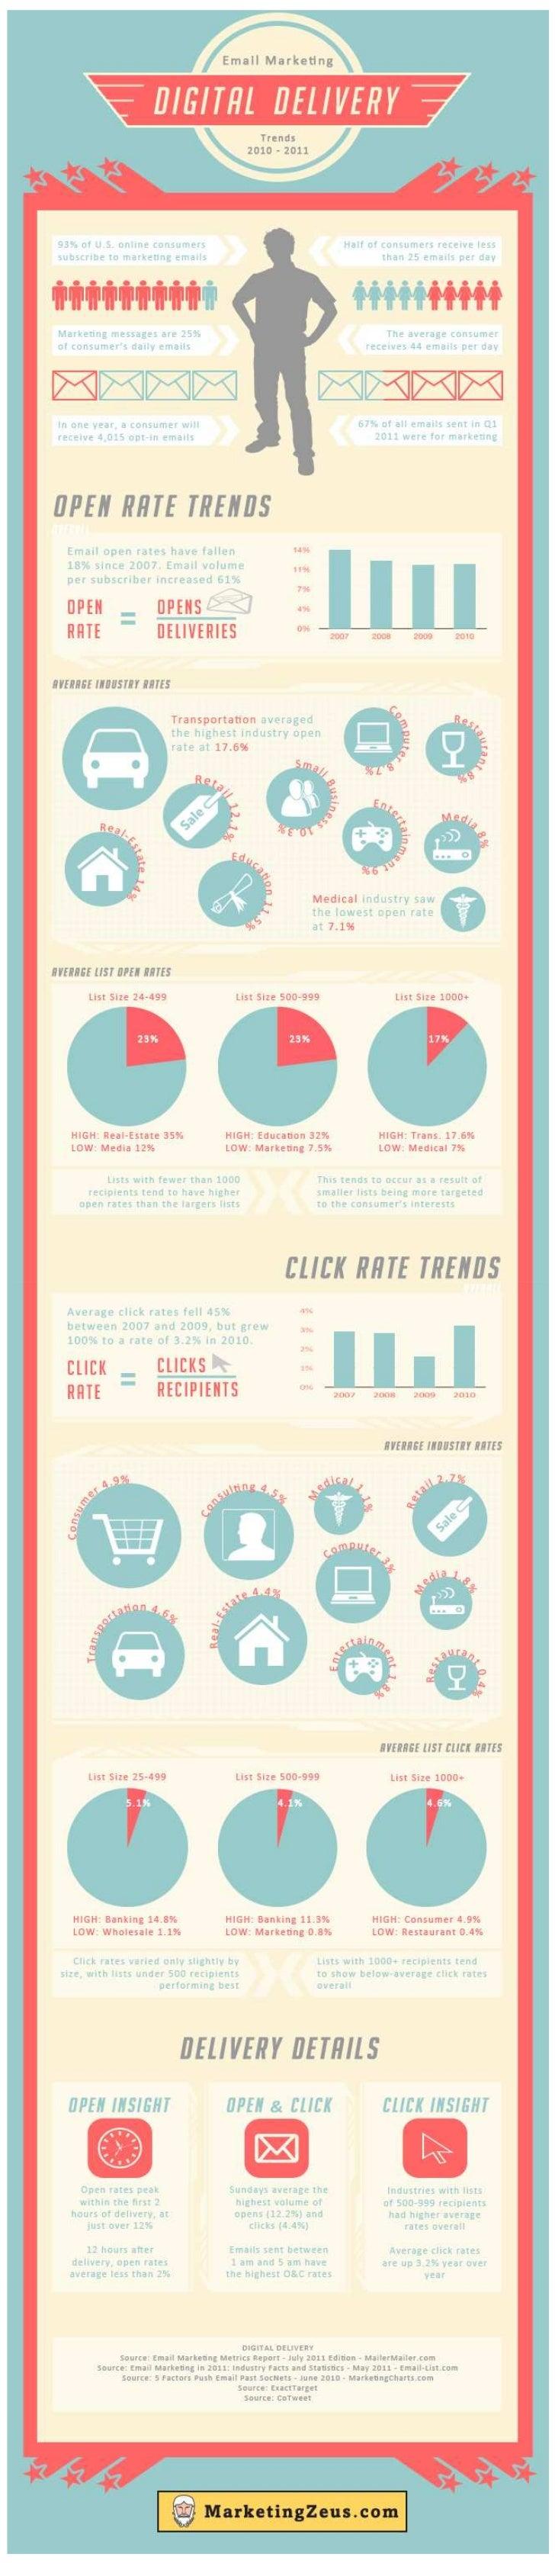 Tendencias email marketing USA 2010-2011 (MarketingZeus) - JUL11